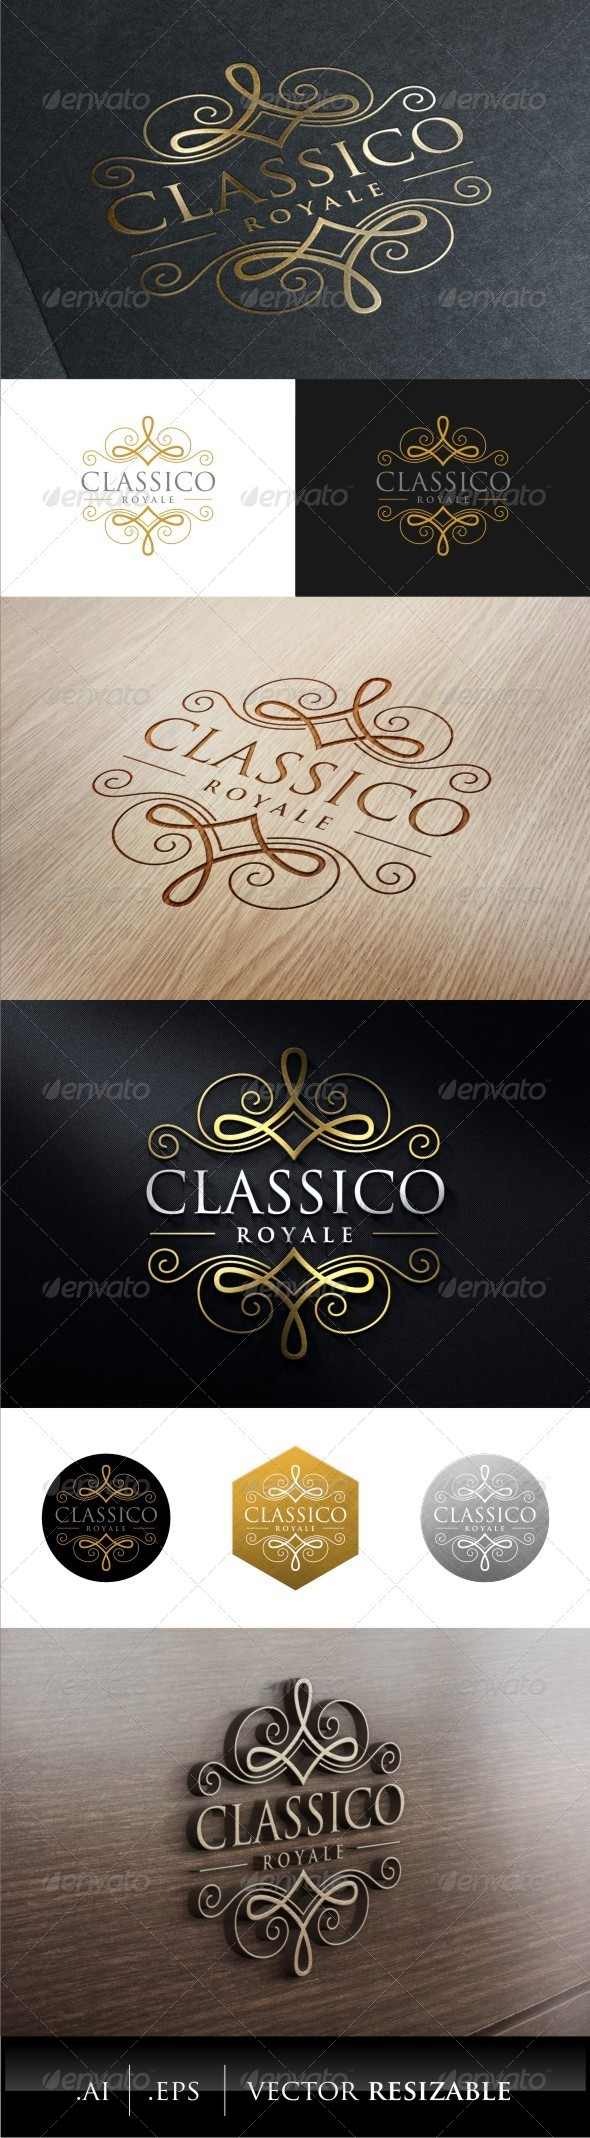 GraphicRiver Classic Royal Logo 7879641